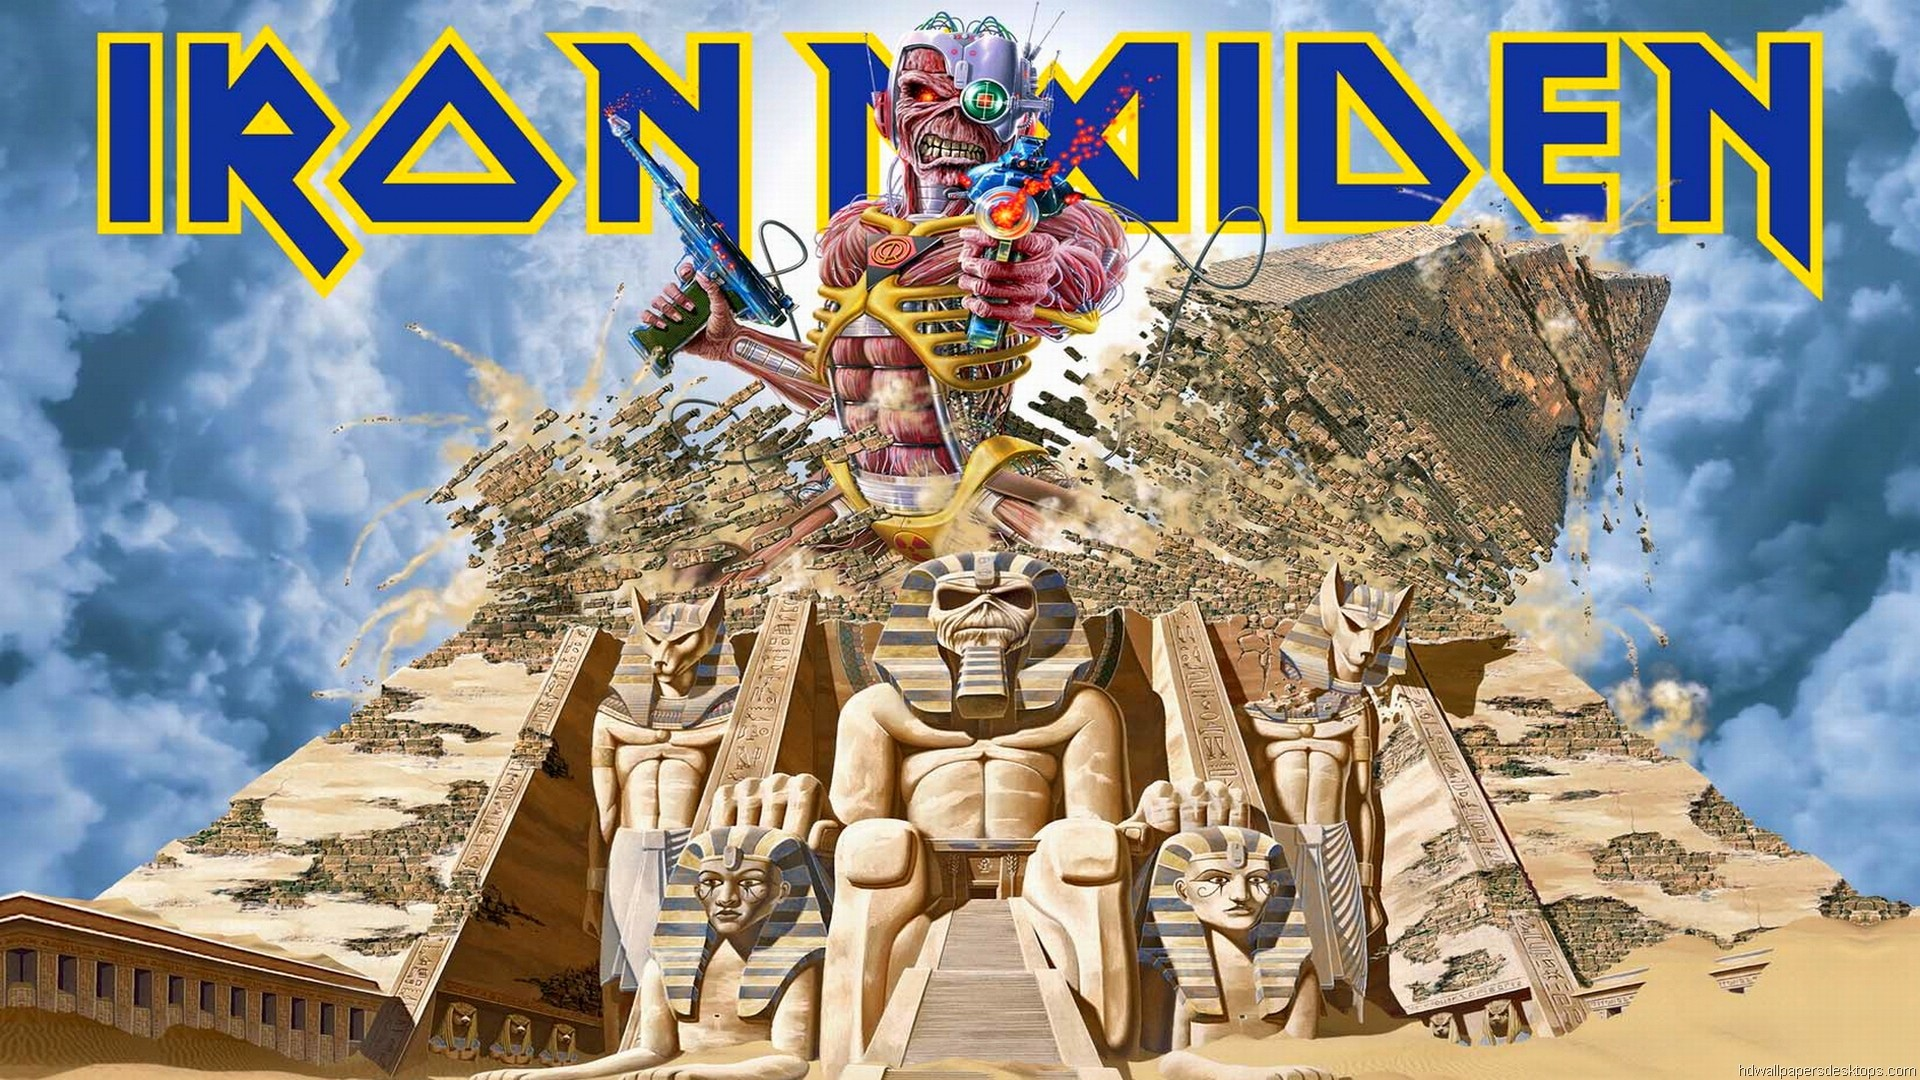 Iron Maiden Wallpaper Download Free Stunning High Resolution